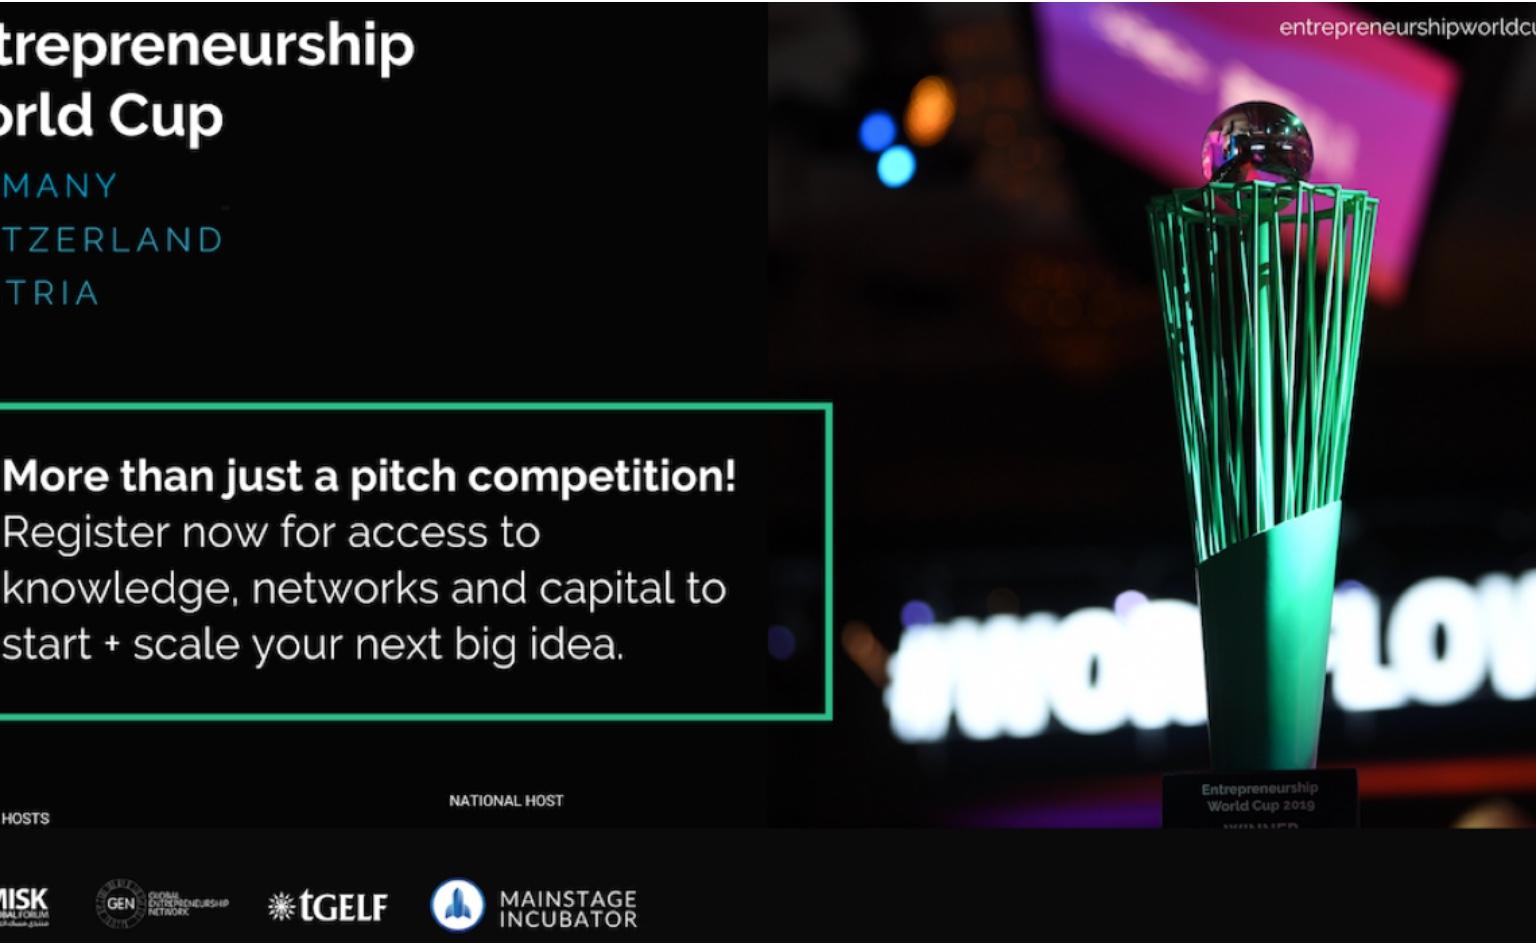 Inscrições abertas para Entrepreneurship World Cup